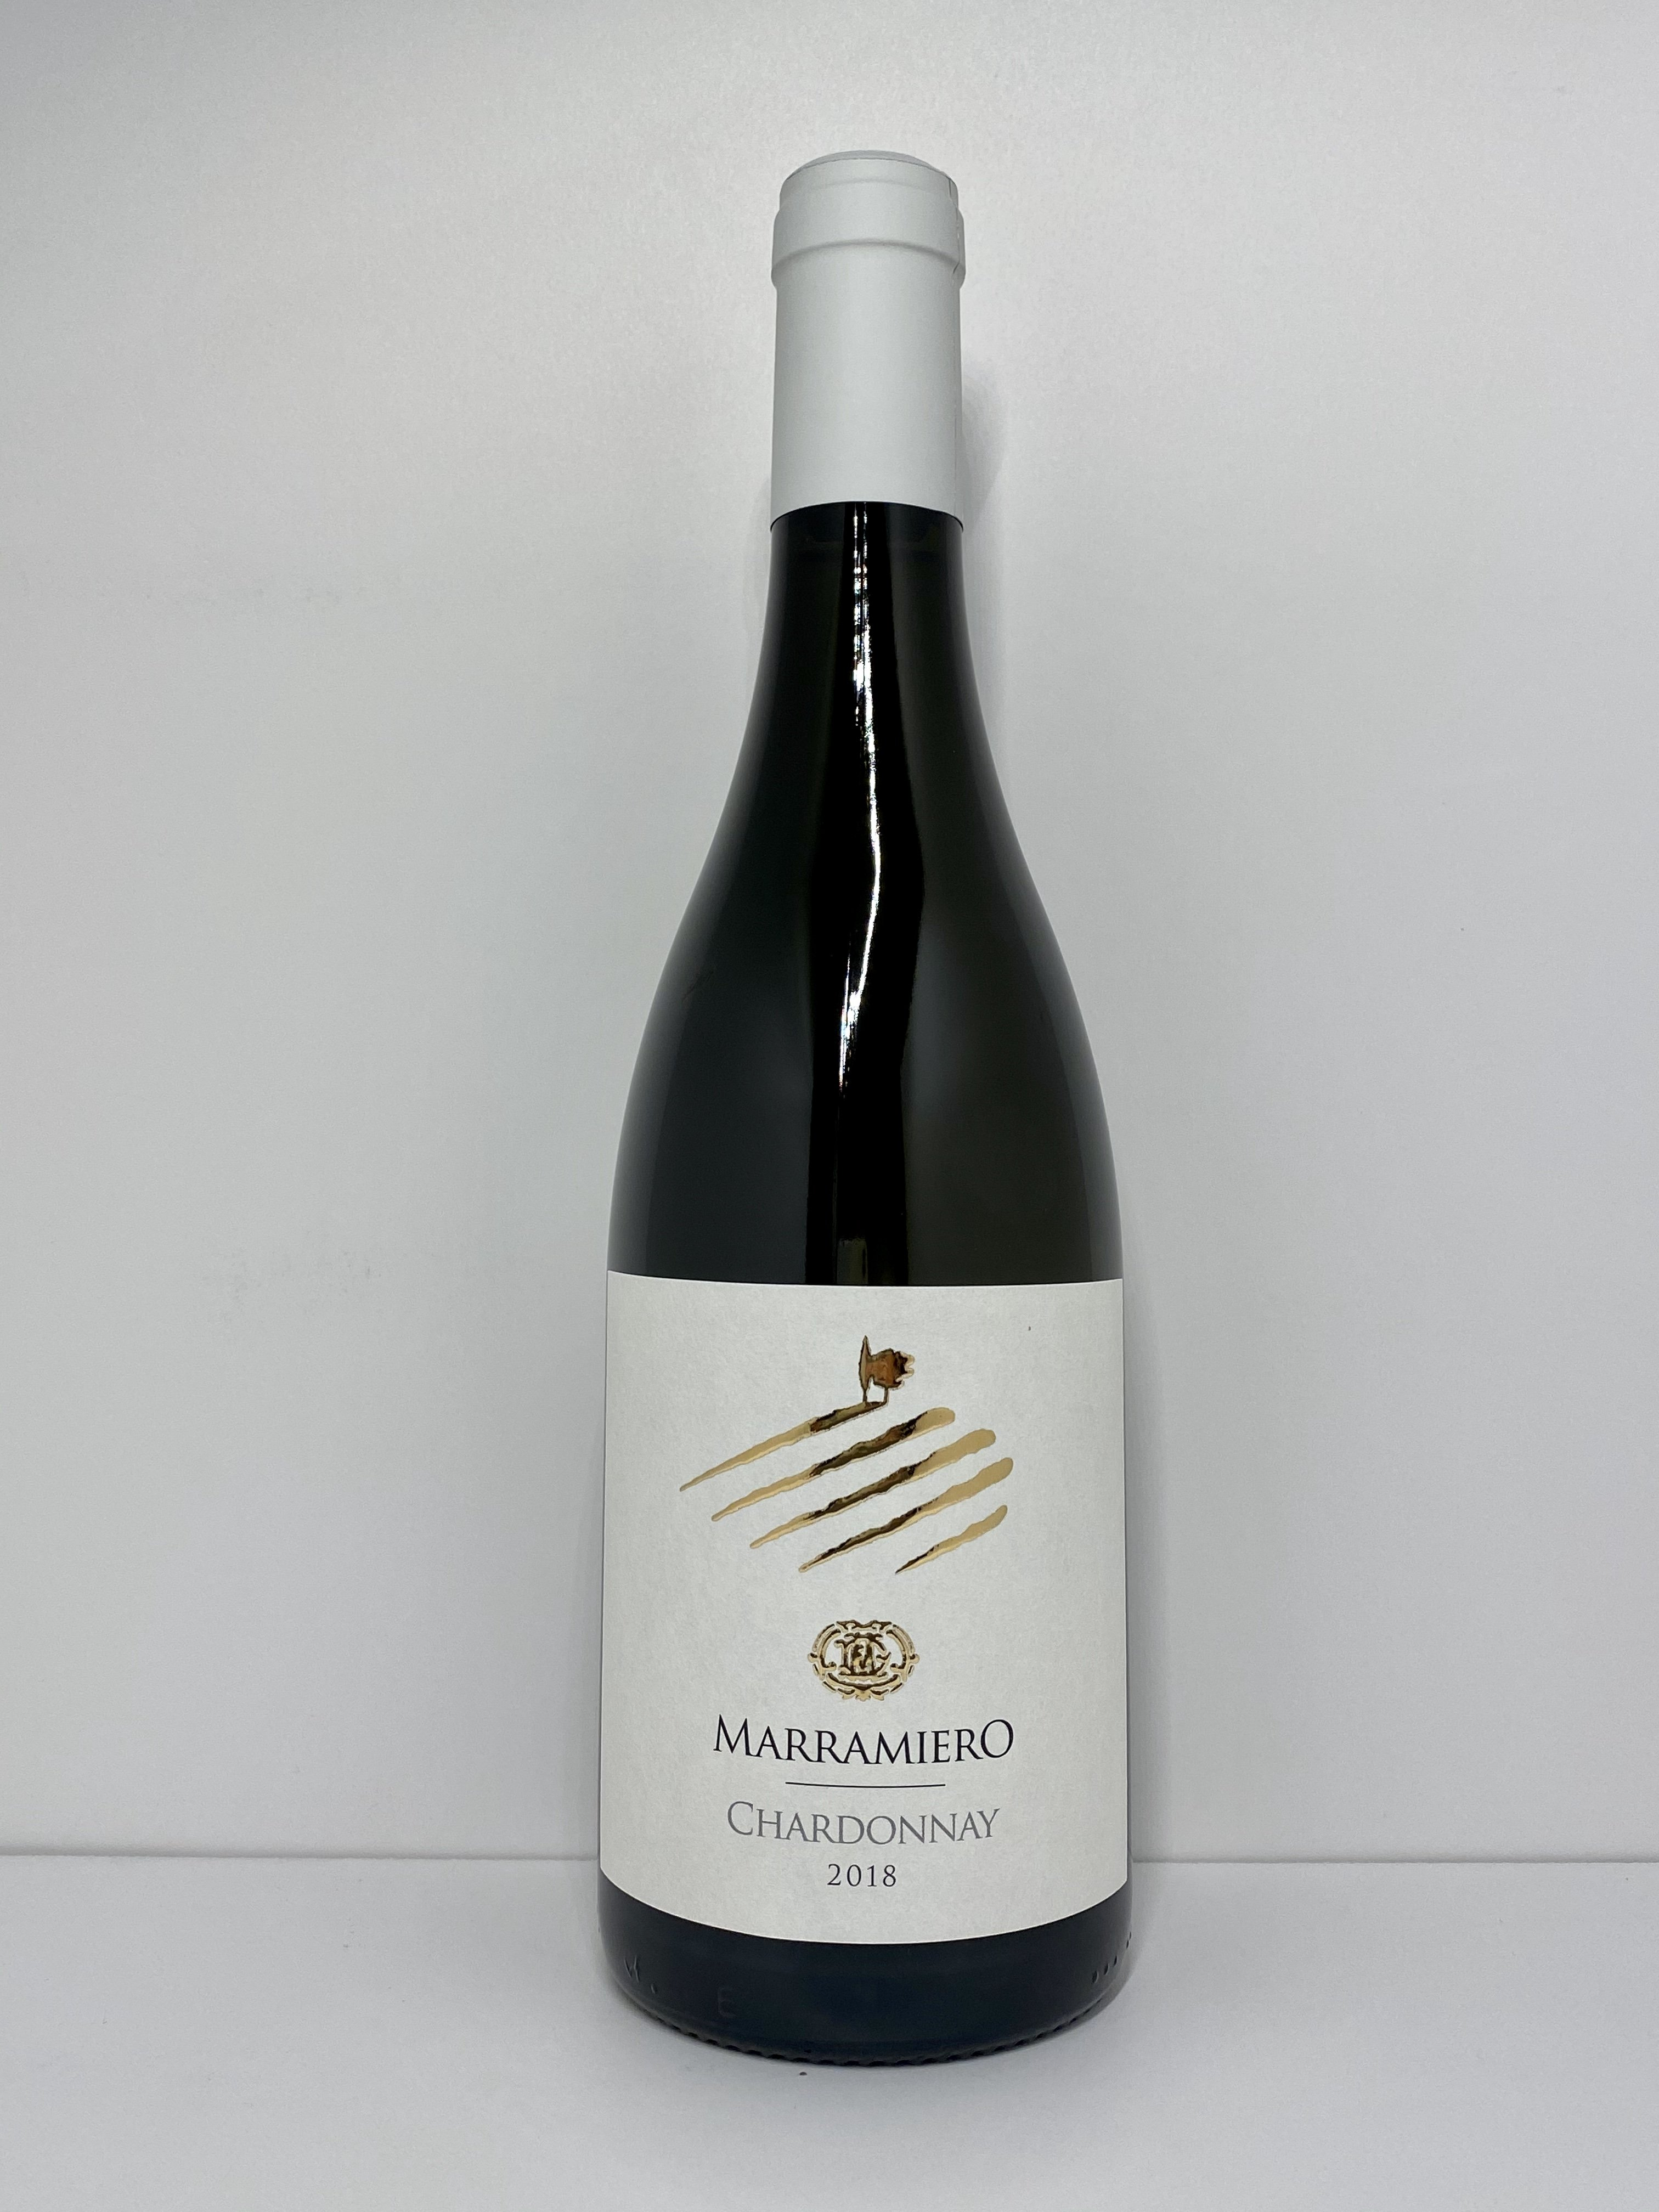 Marramiero Chardonnay